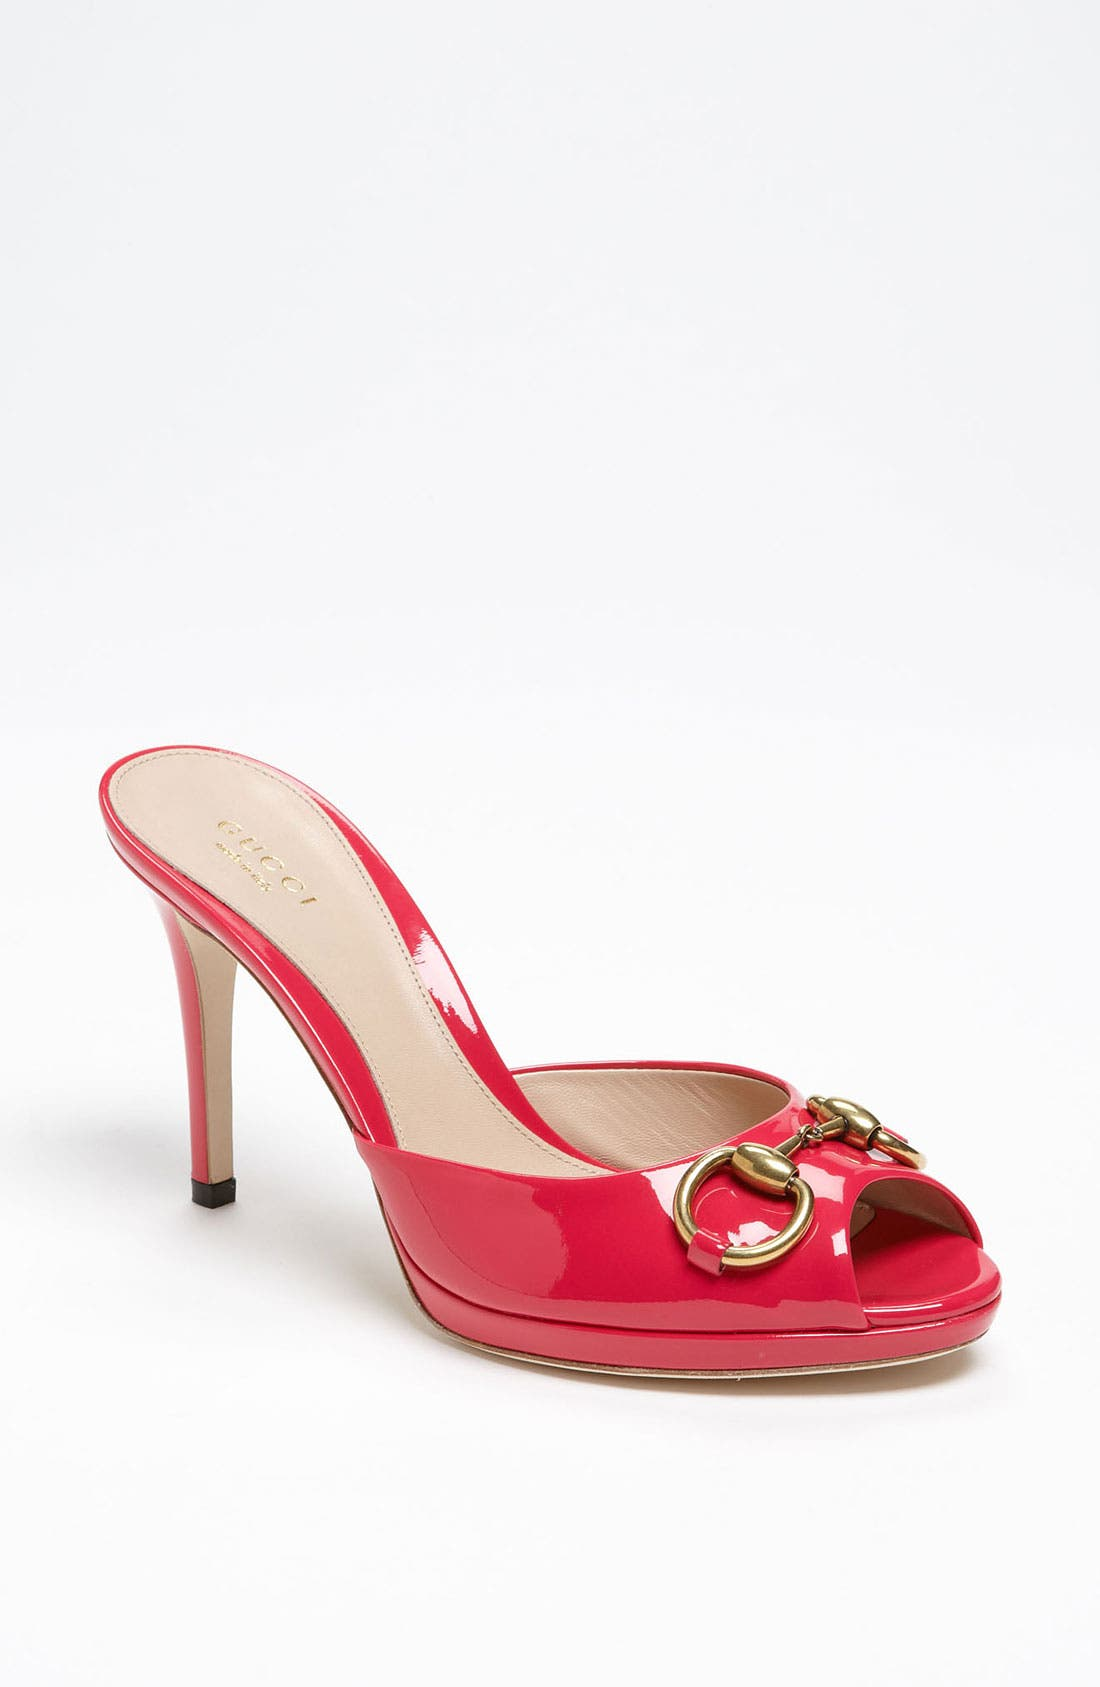 Main Image - Gucci 'New Hollywood' Slide Sandal